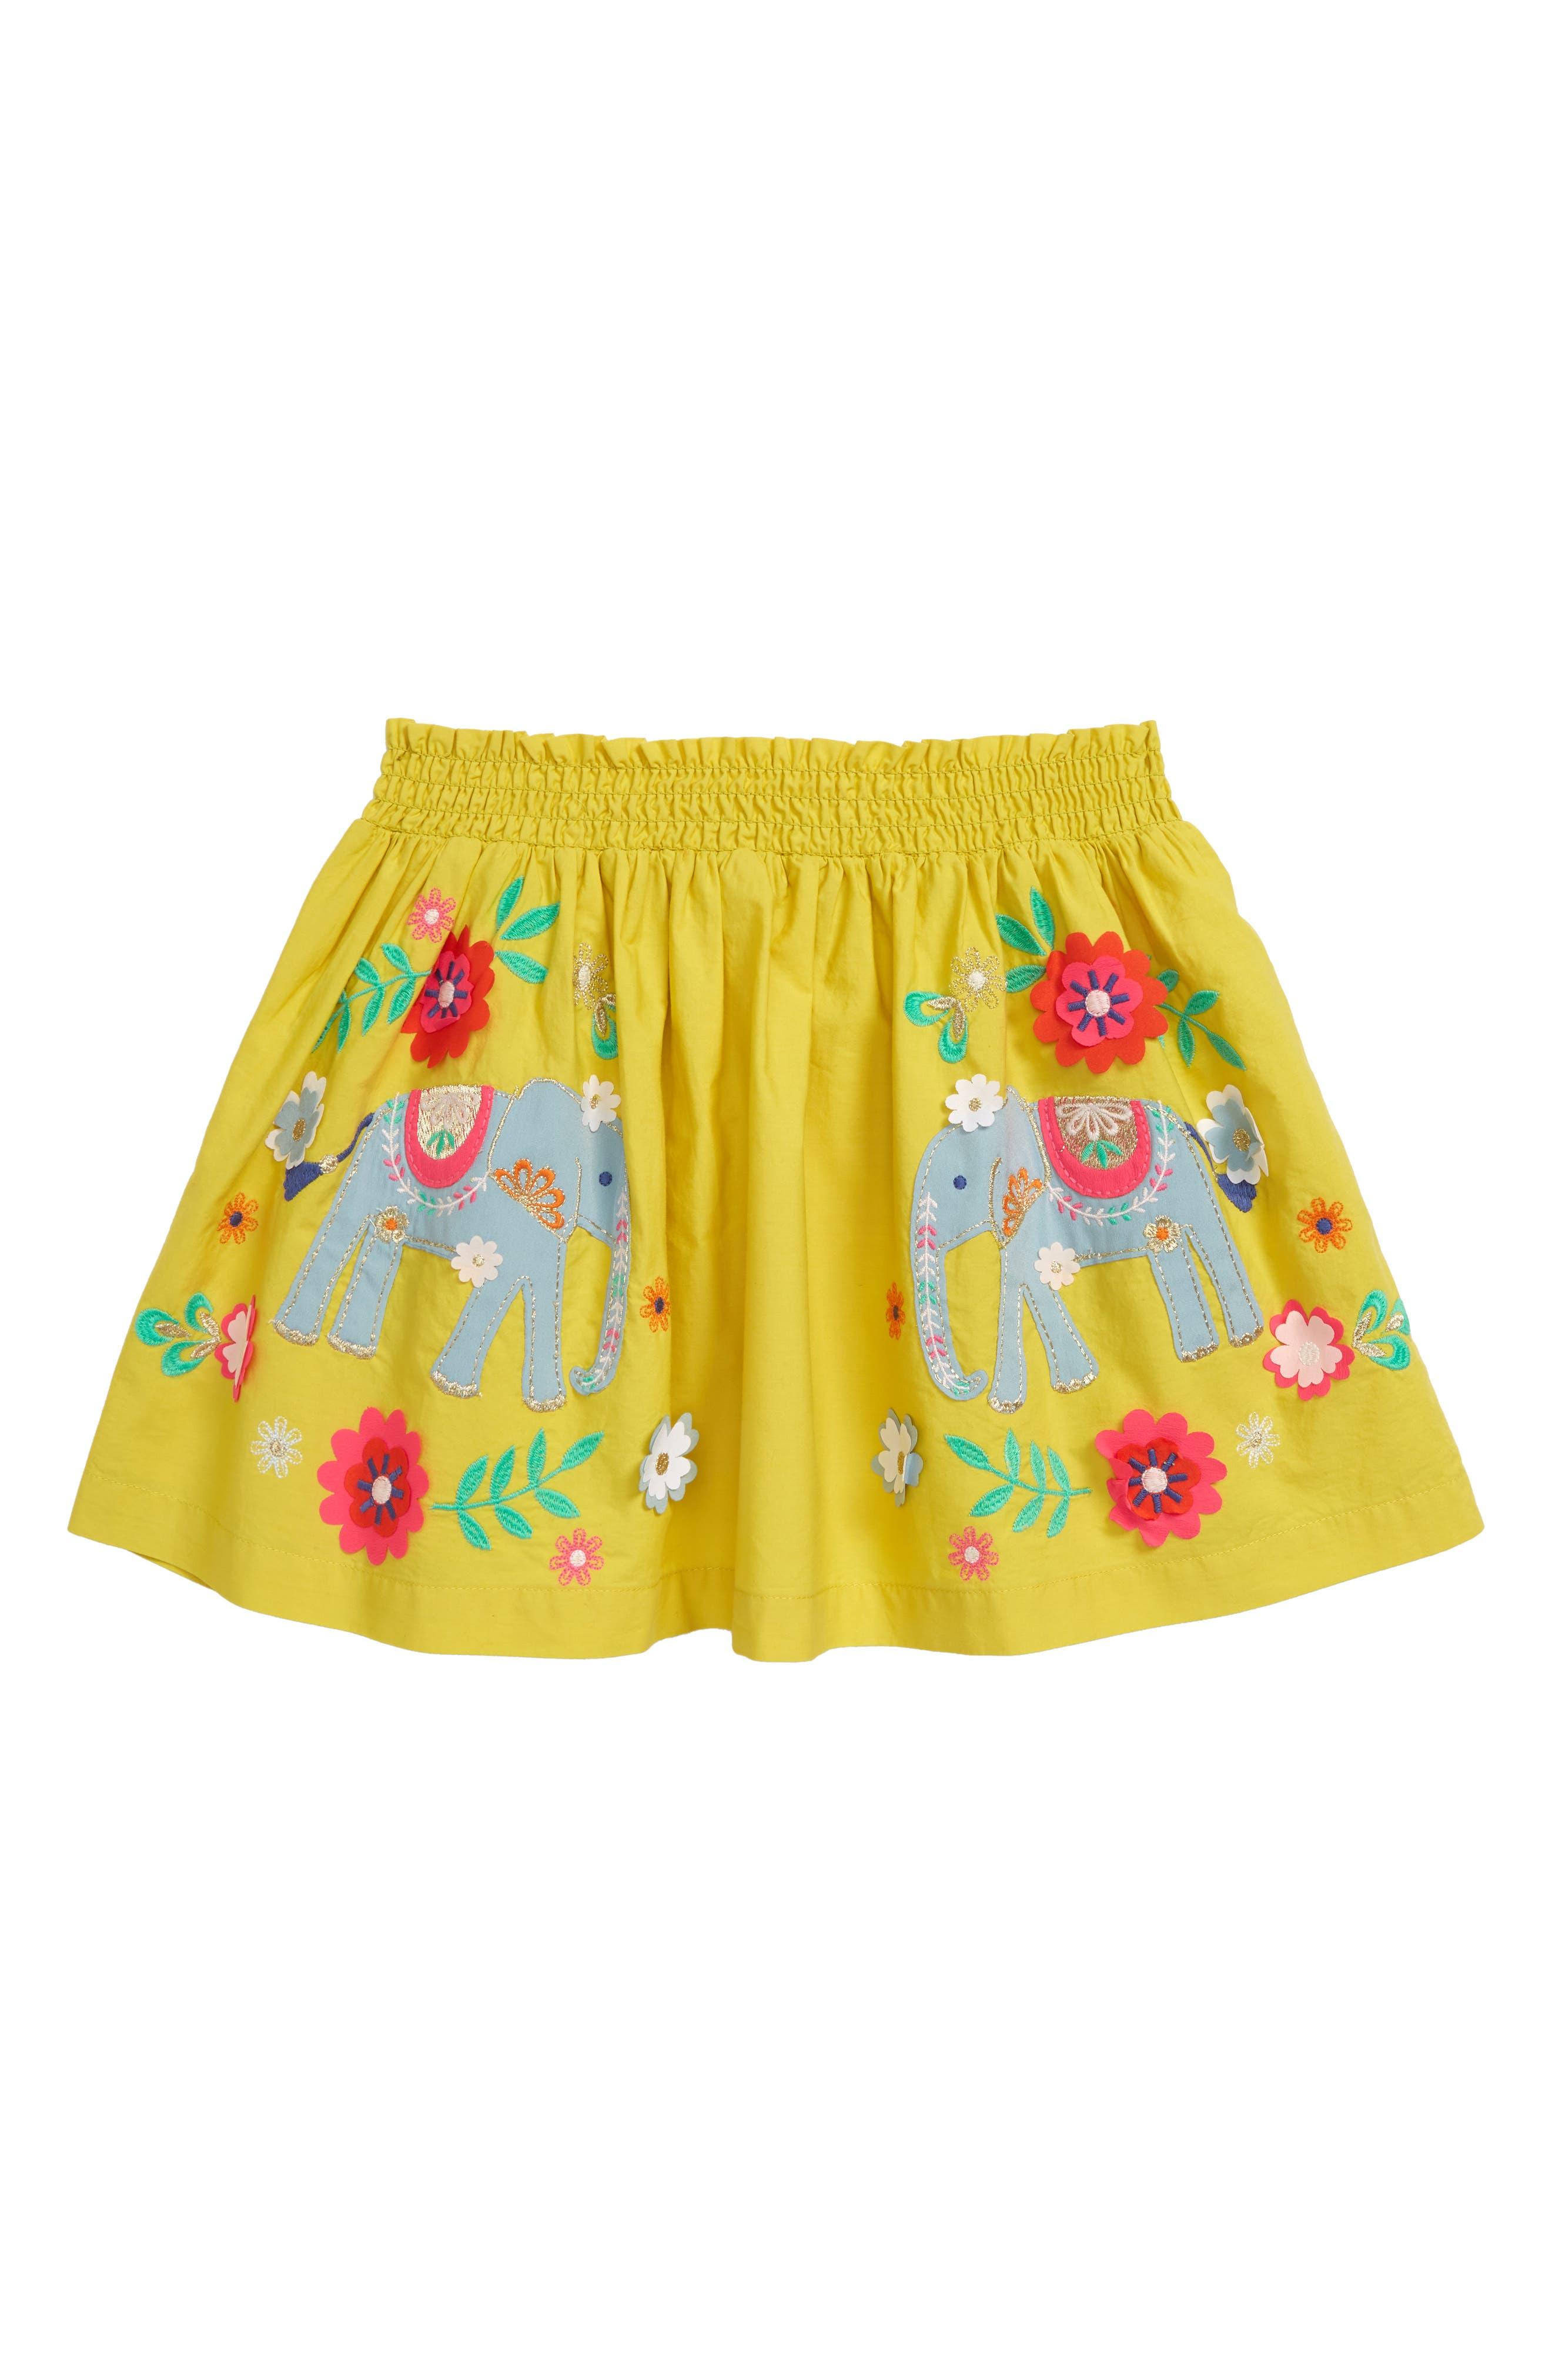 Toddler Girls Mini Boden Applique Skirt Size 34Y  Yellow